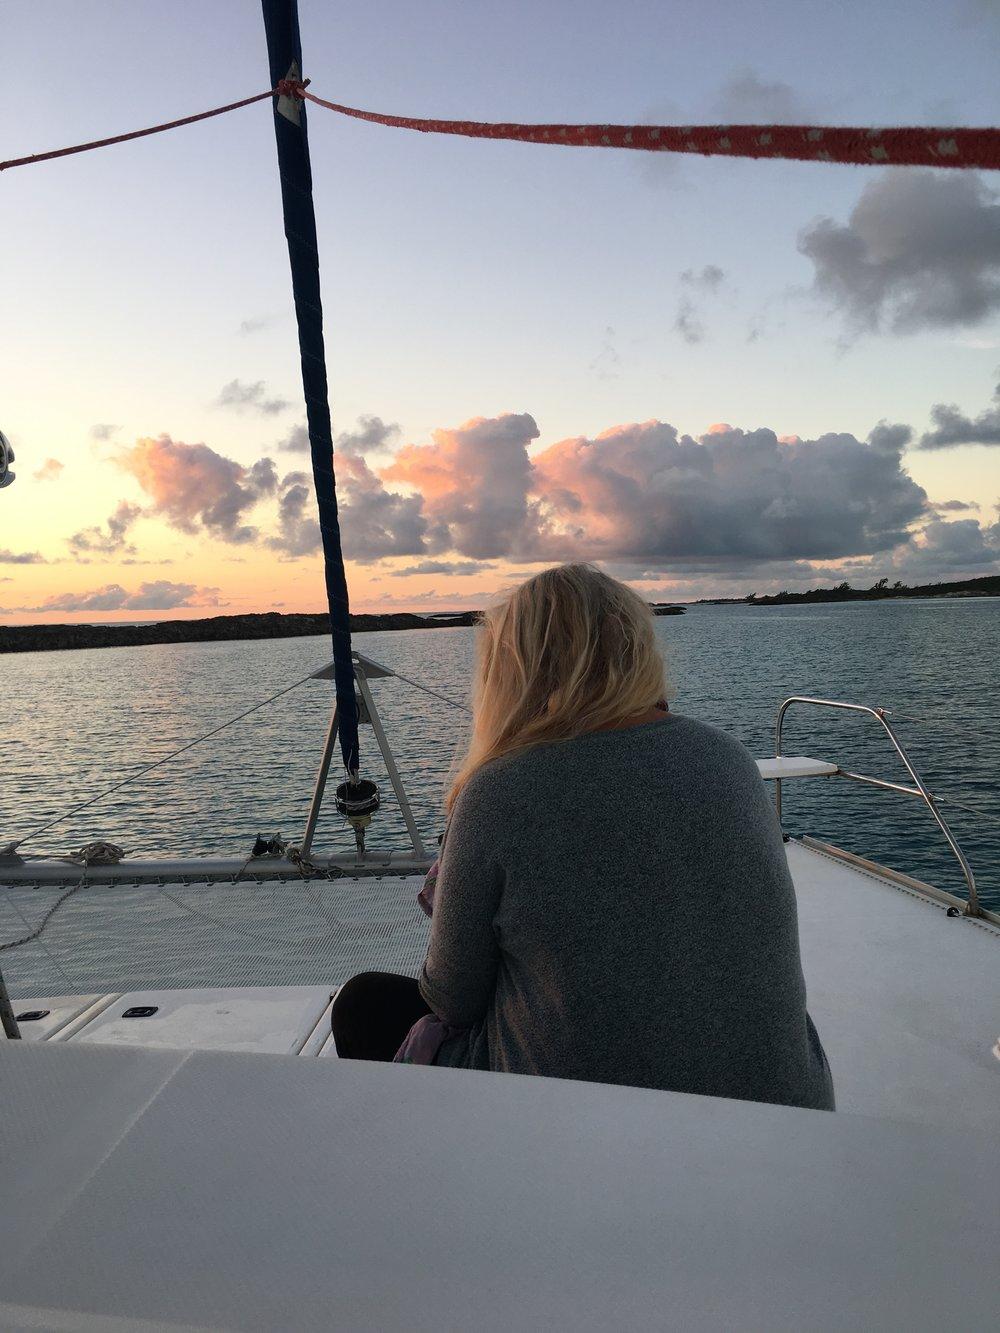 A meditative Mystique moment near Spirit Cay.